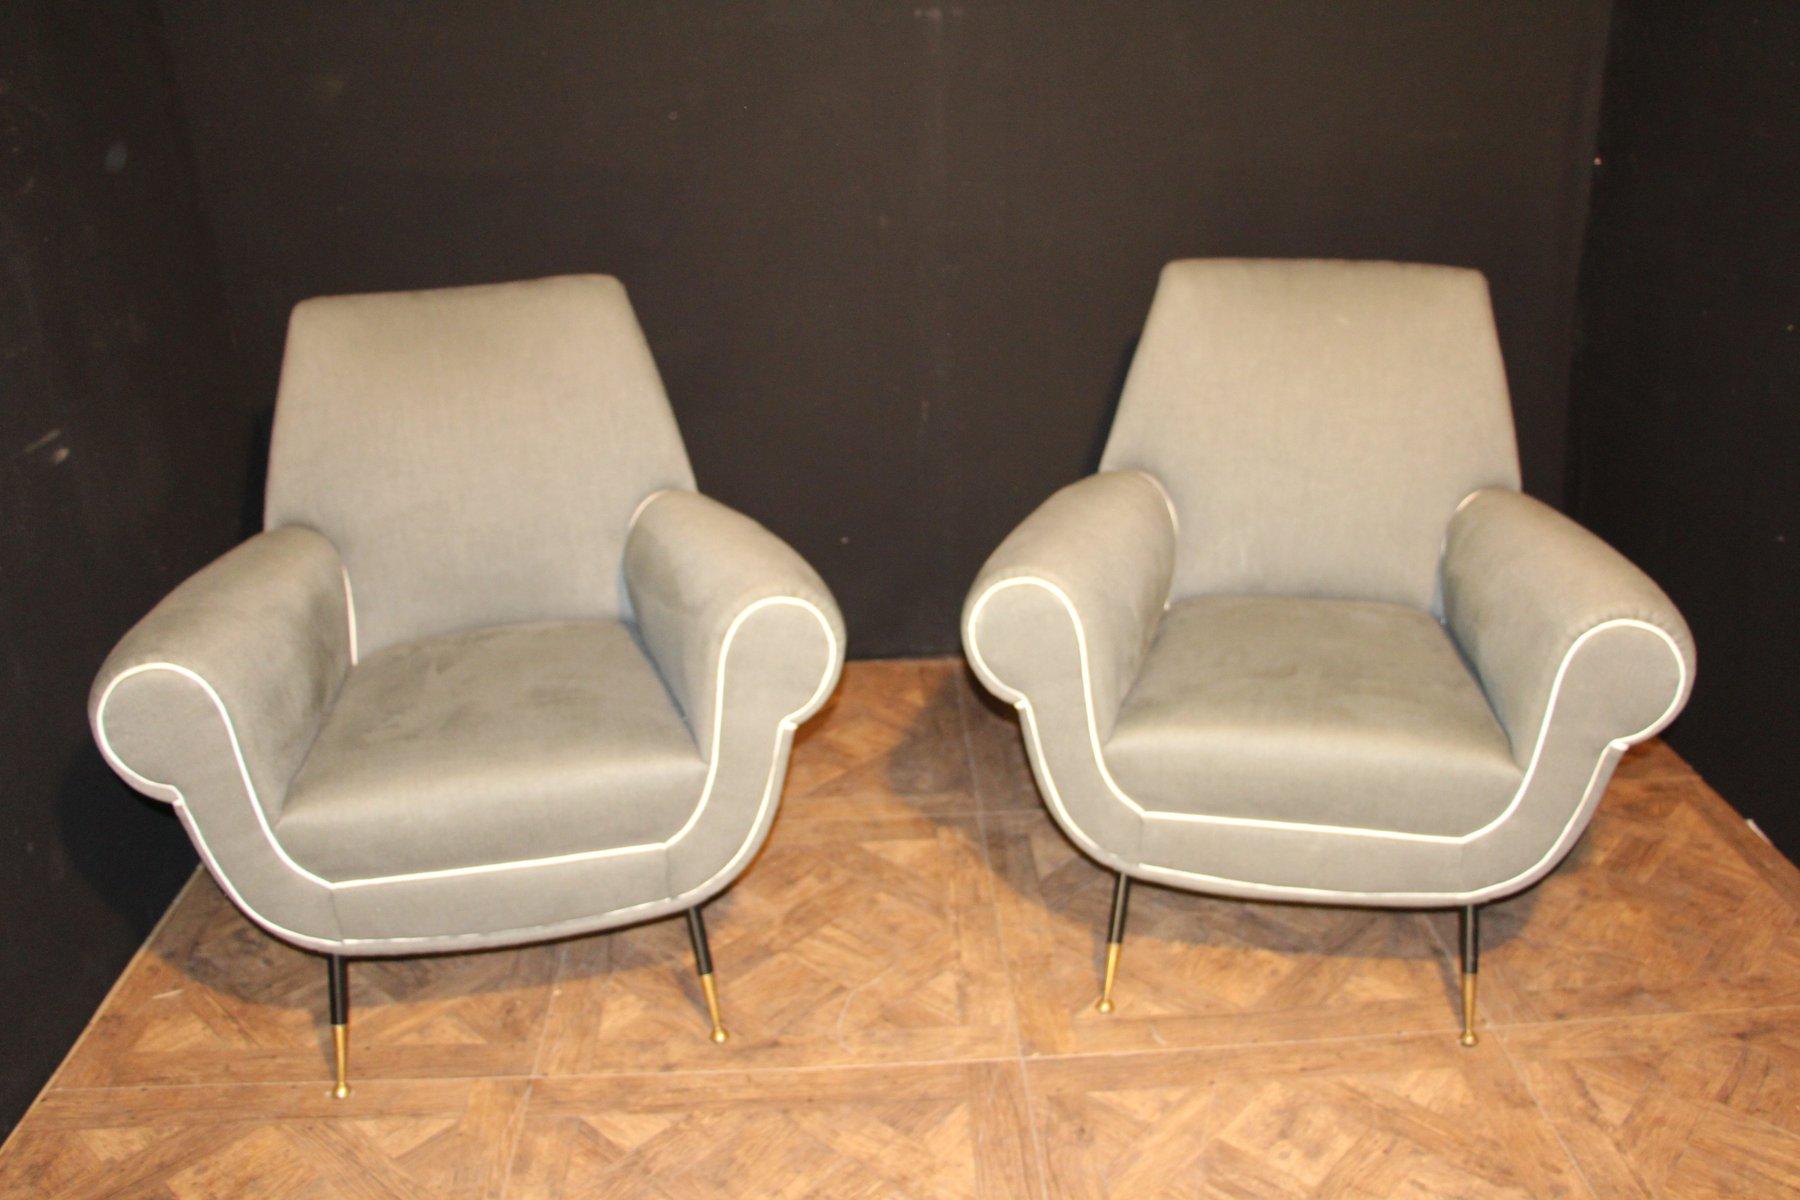 Graue italienische sessel 1950er 2er set bei pamono kaufen for Italienische sessel design